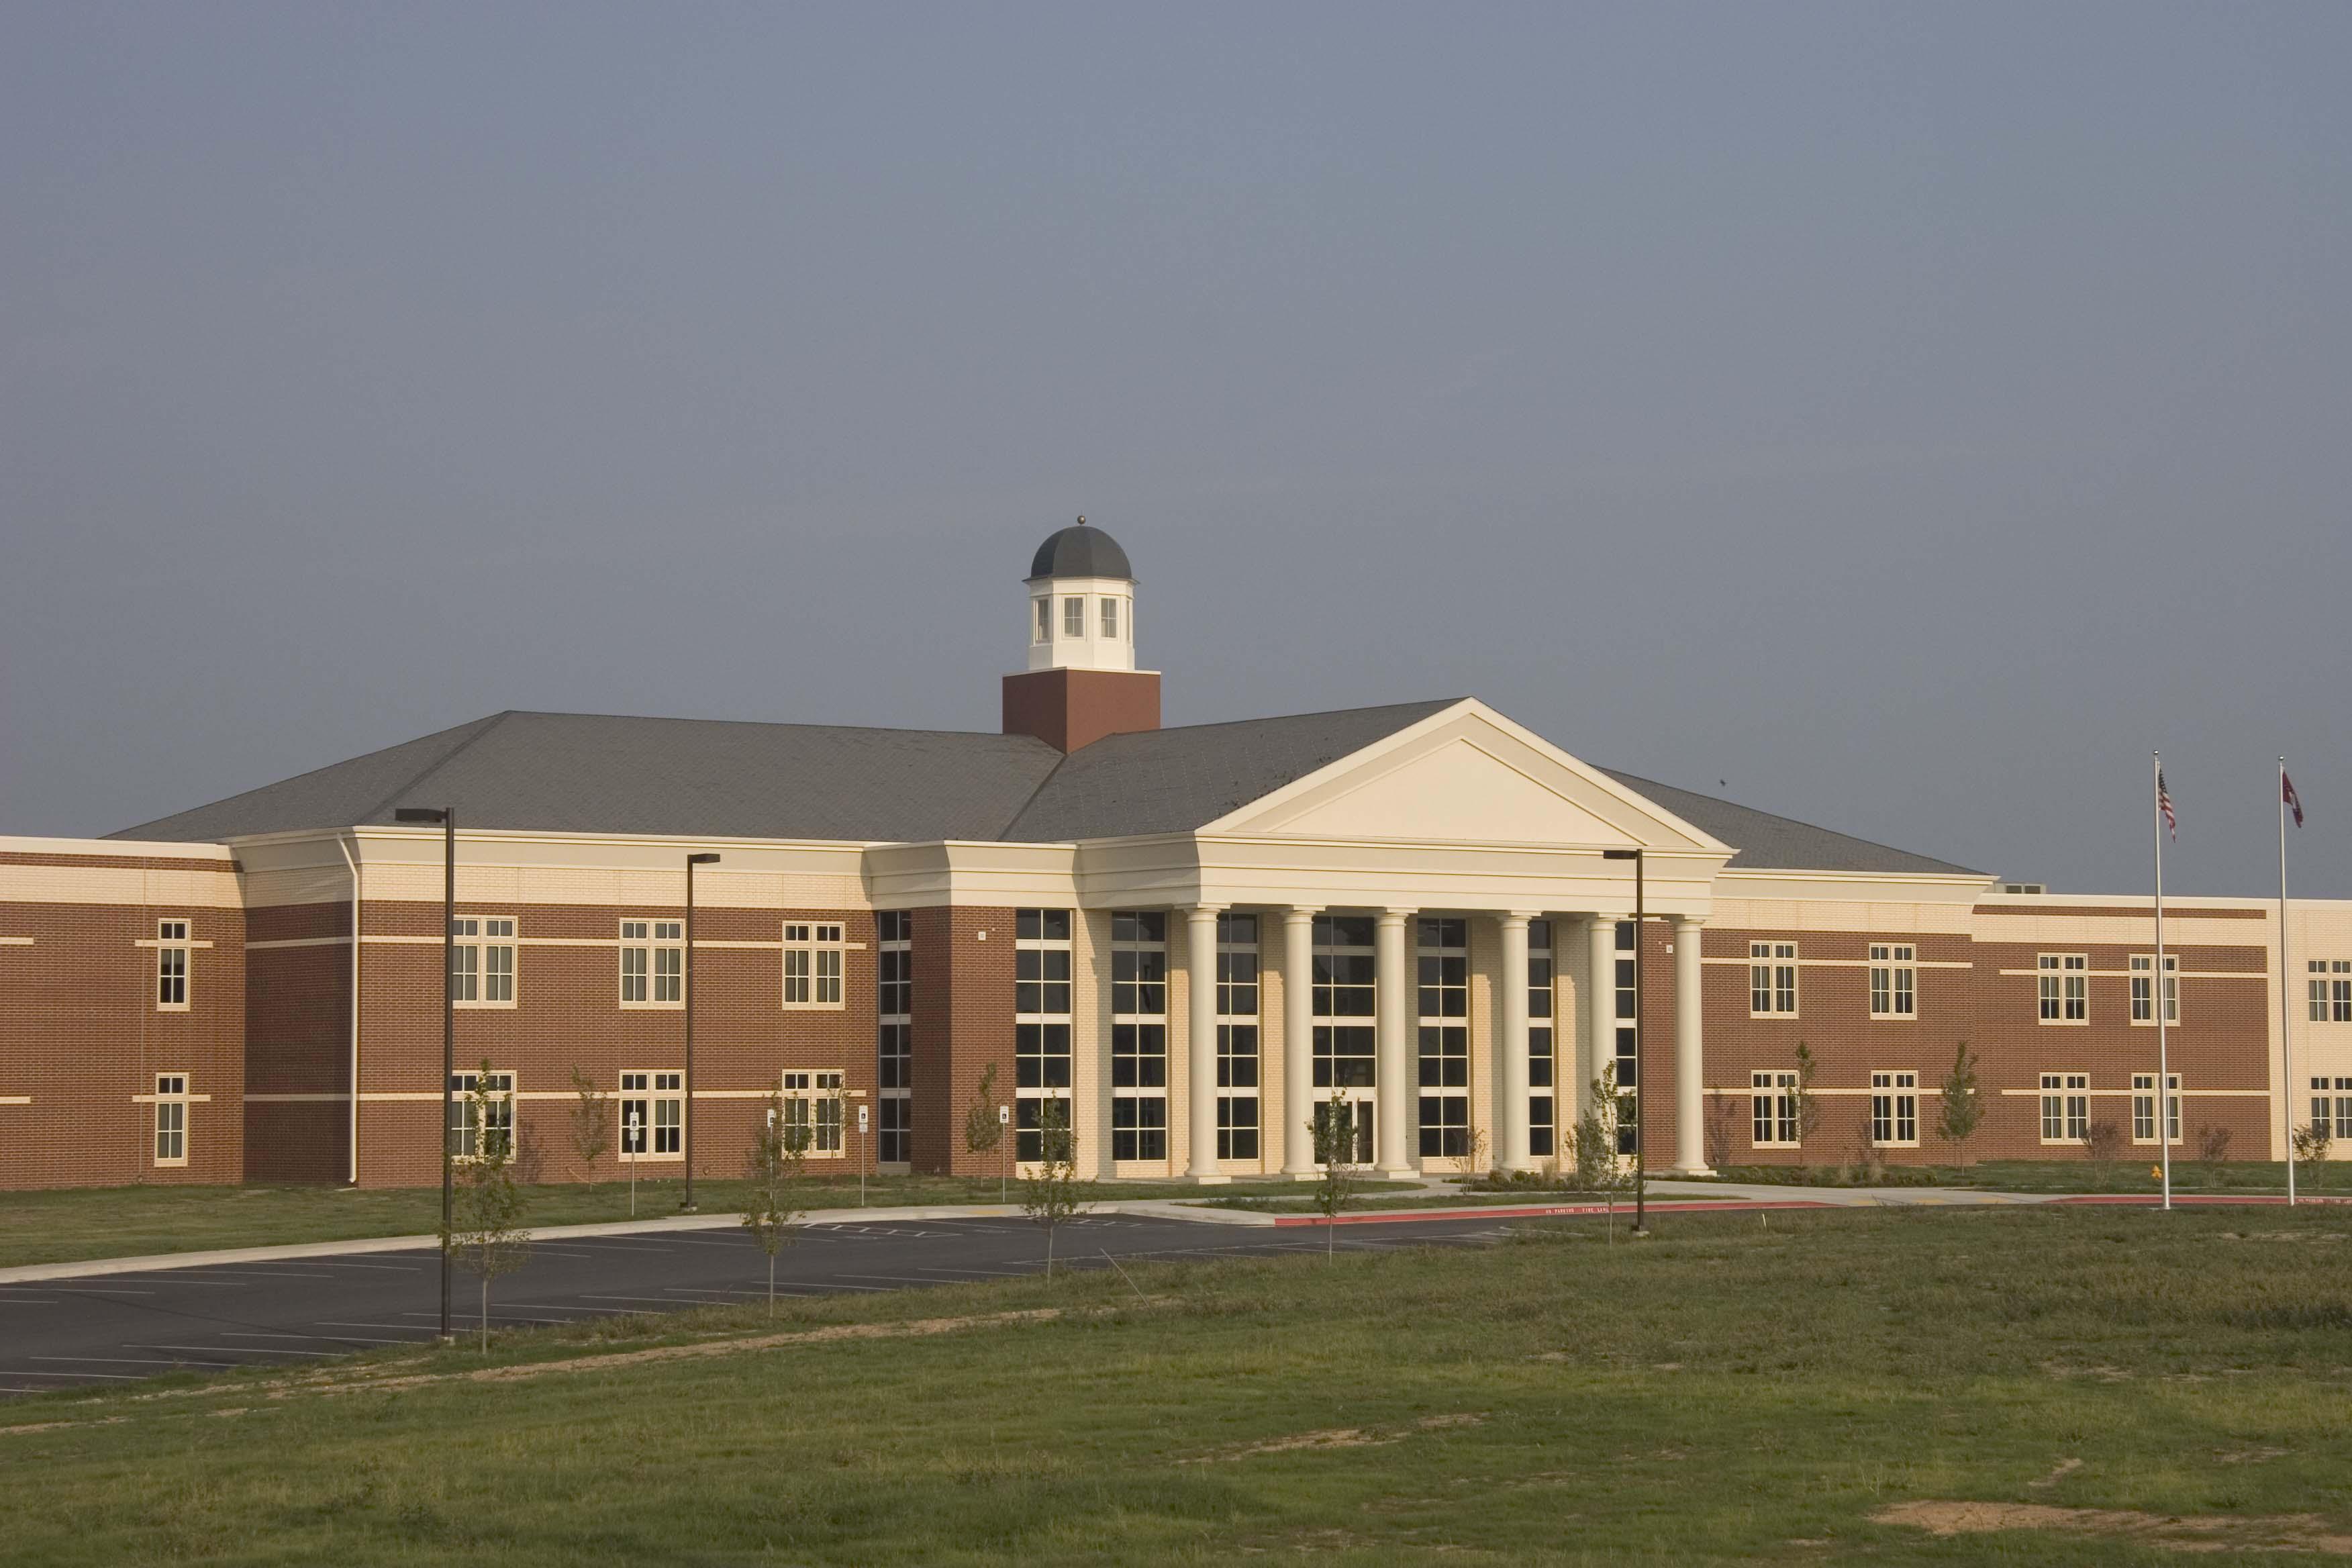 Photo of the Har-Ber High School.